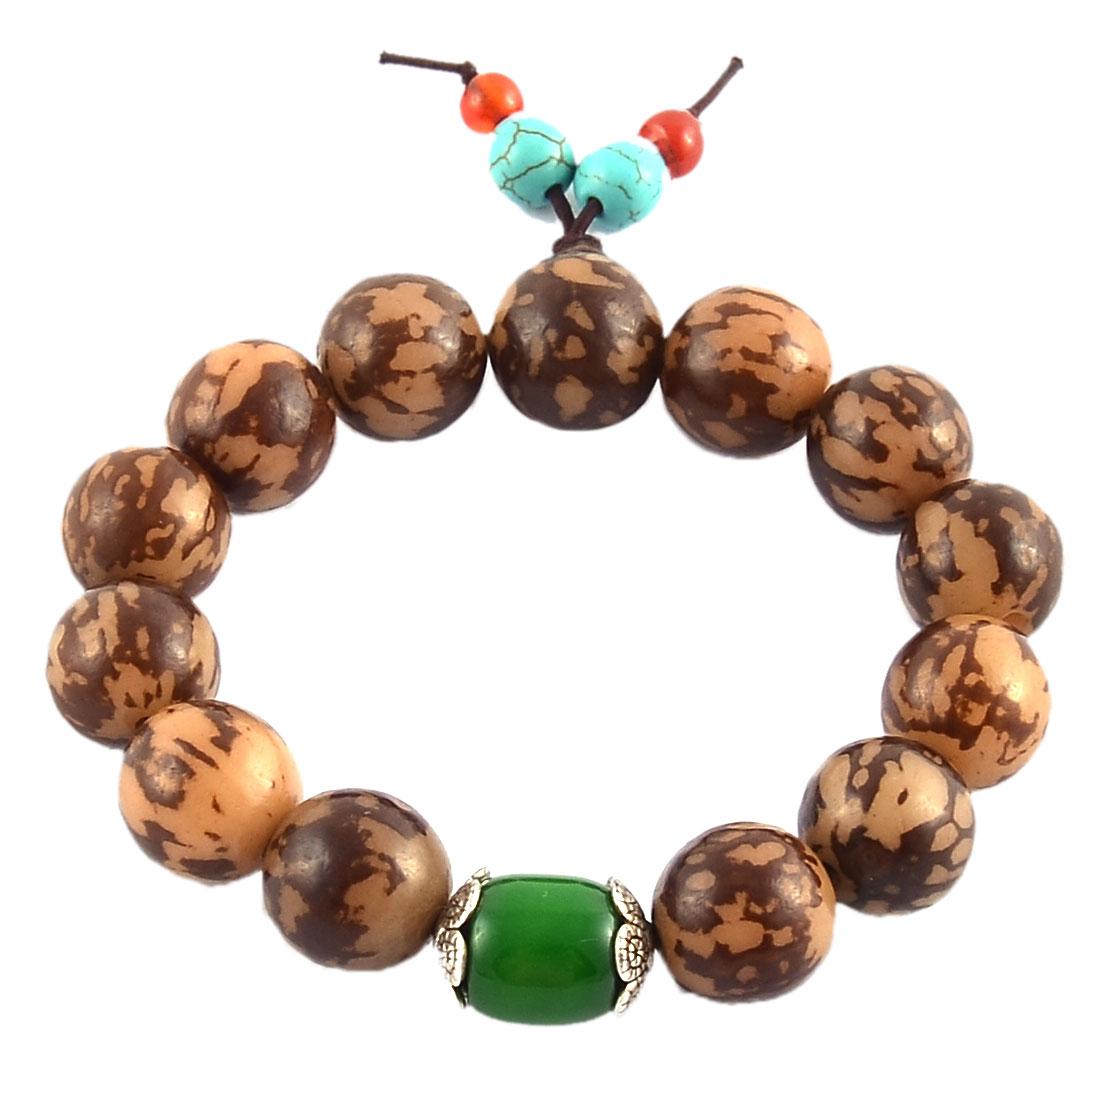 Handmade DIY Craft Stretch Round Beads Prayer Wrist Bangle Bracelet Colorful